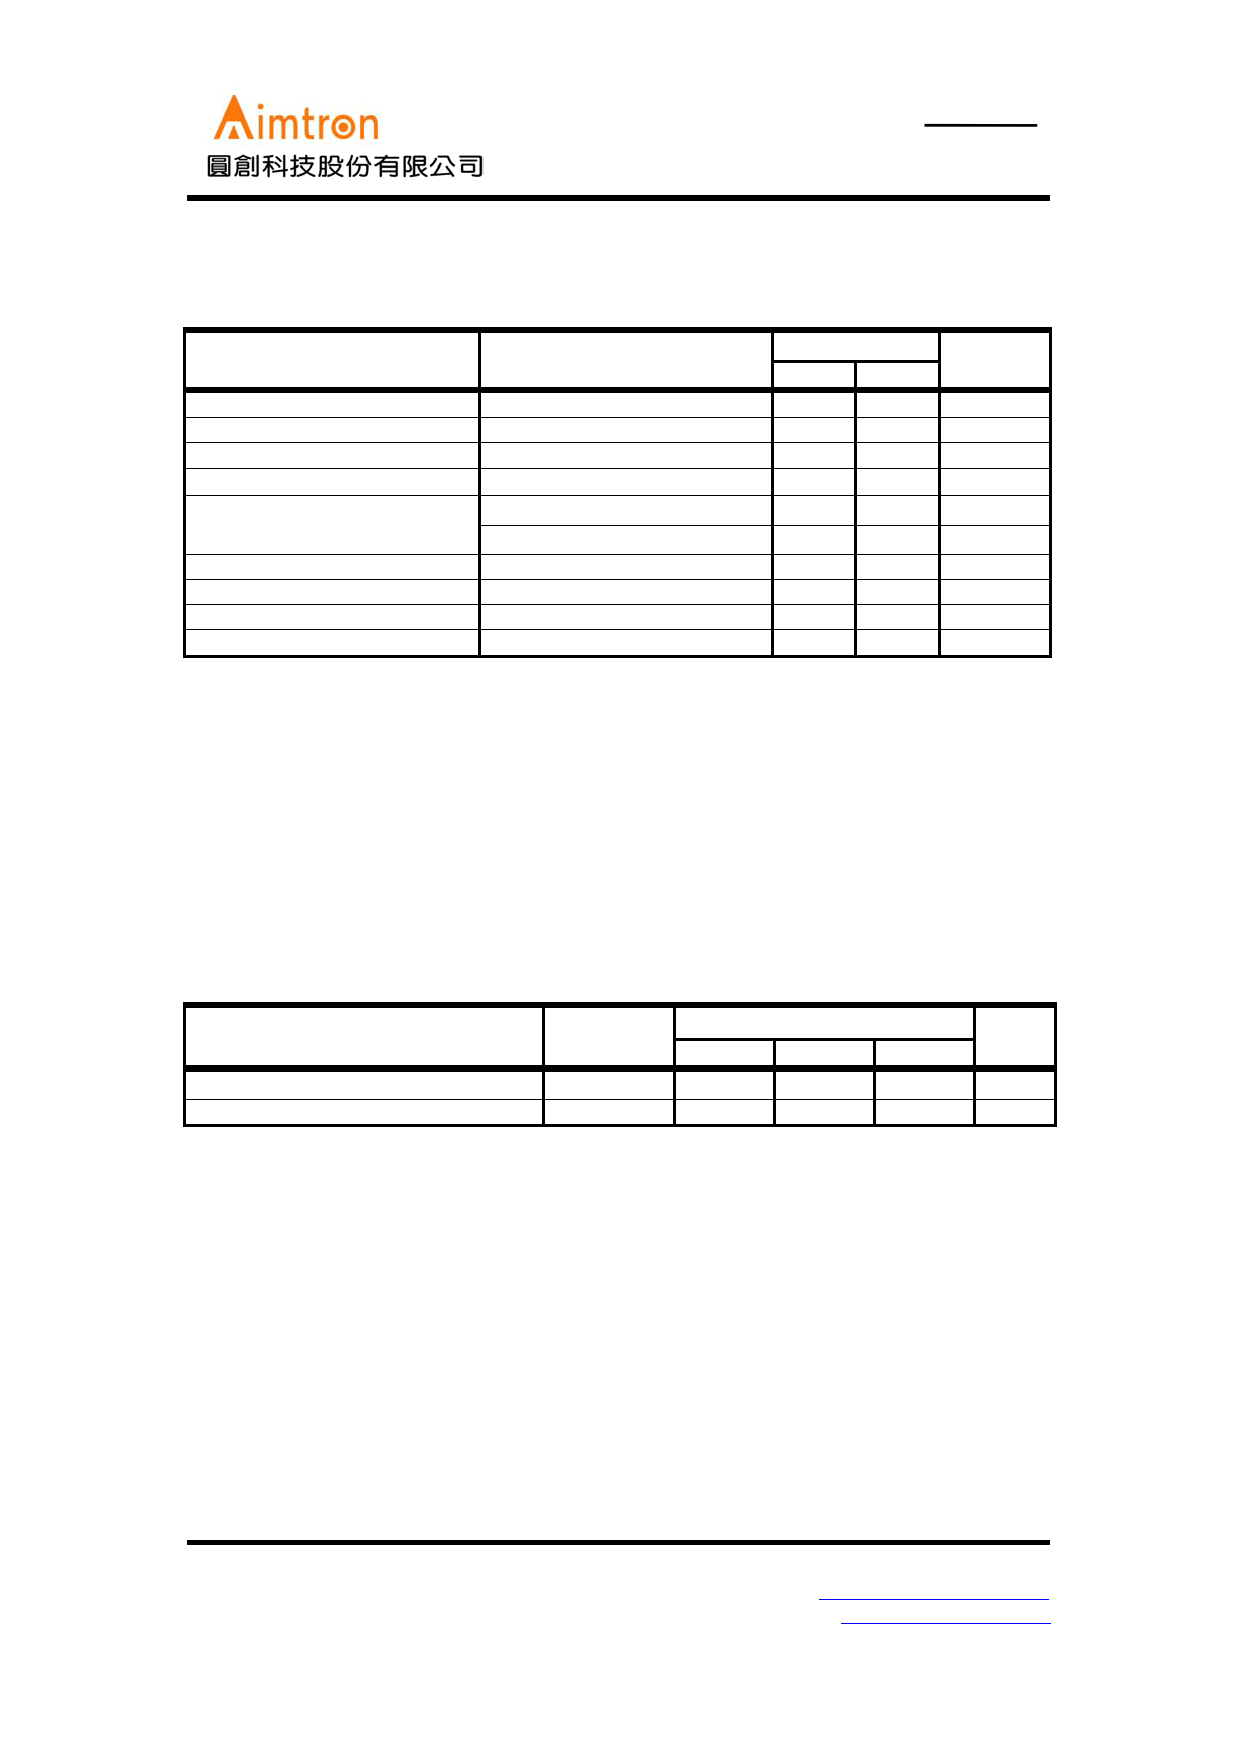 AT1453 pdf, ピン配列